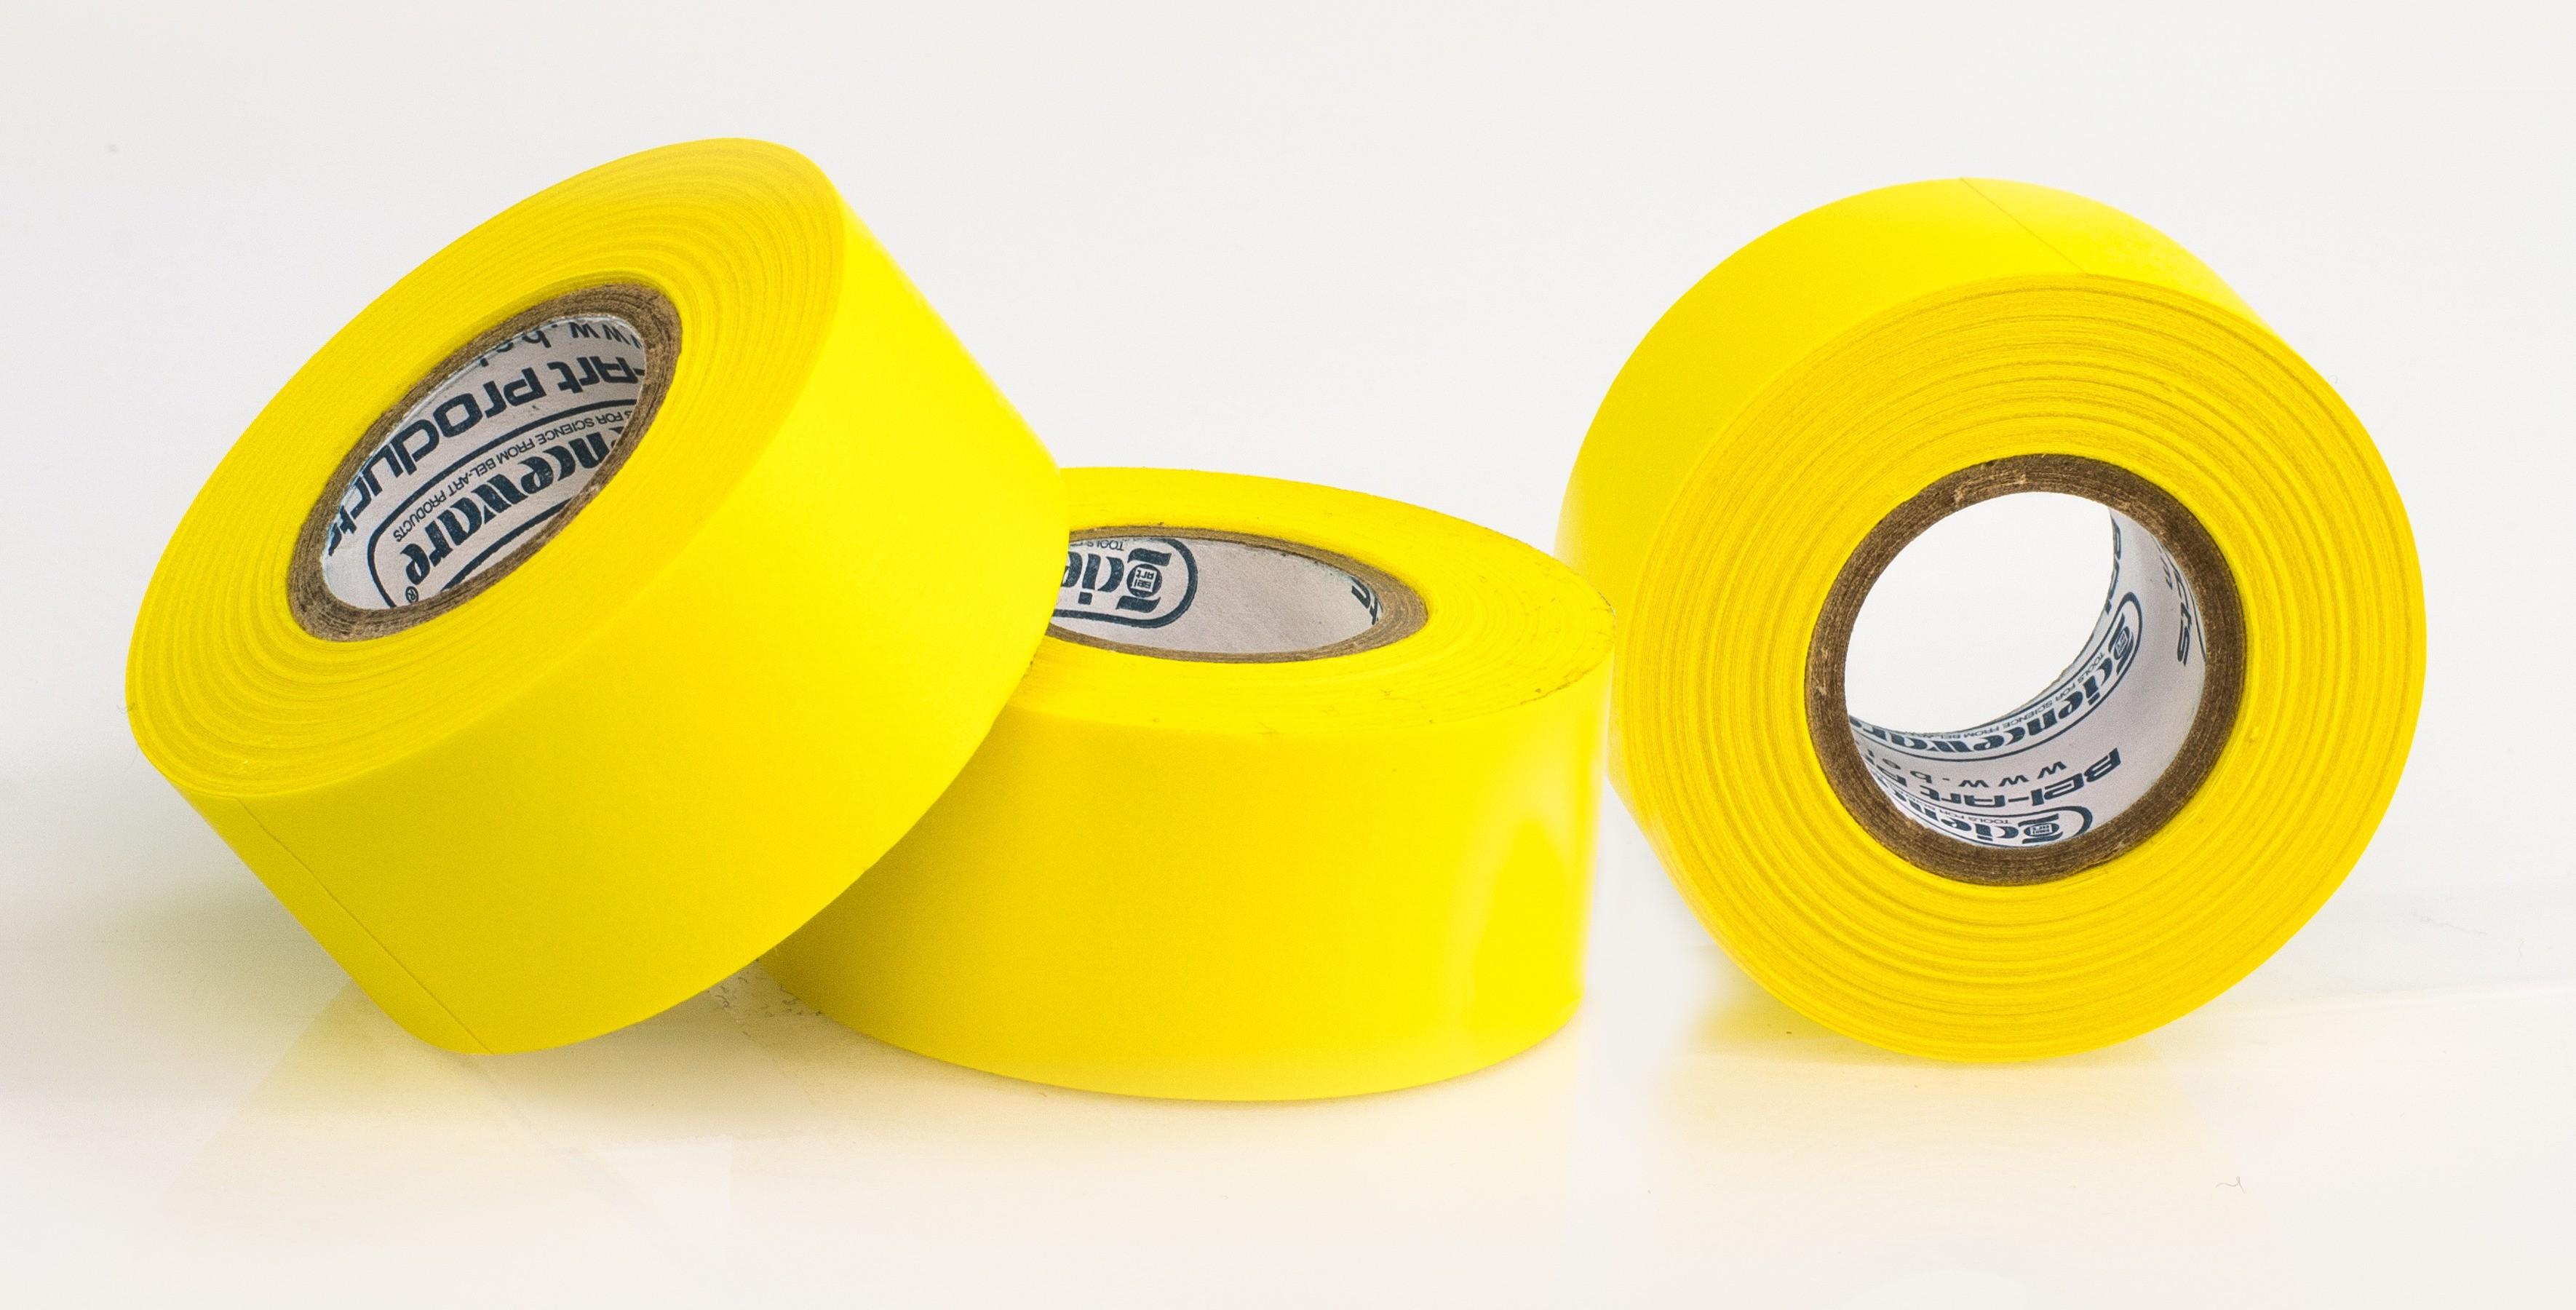 SP Bel-Art Write-On Yellow Label Tape; 15yd Length, 1 in. Width, 1 in. Core (Pack of 3)